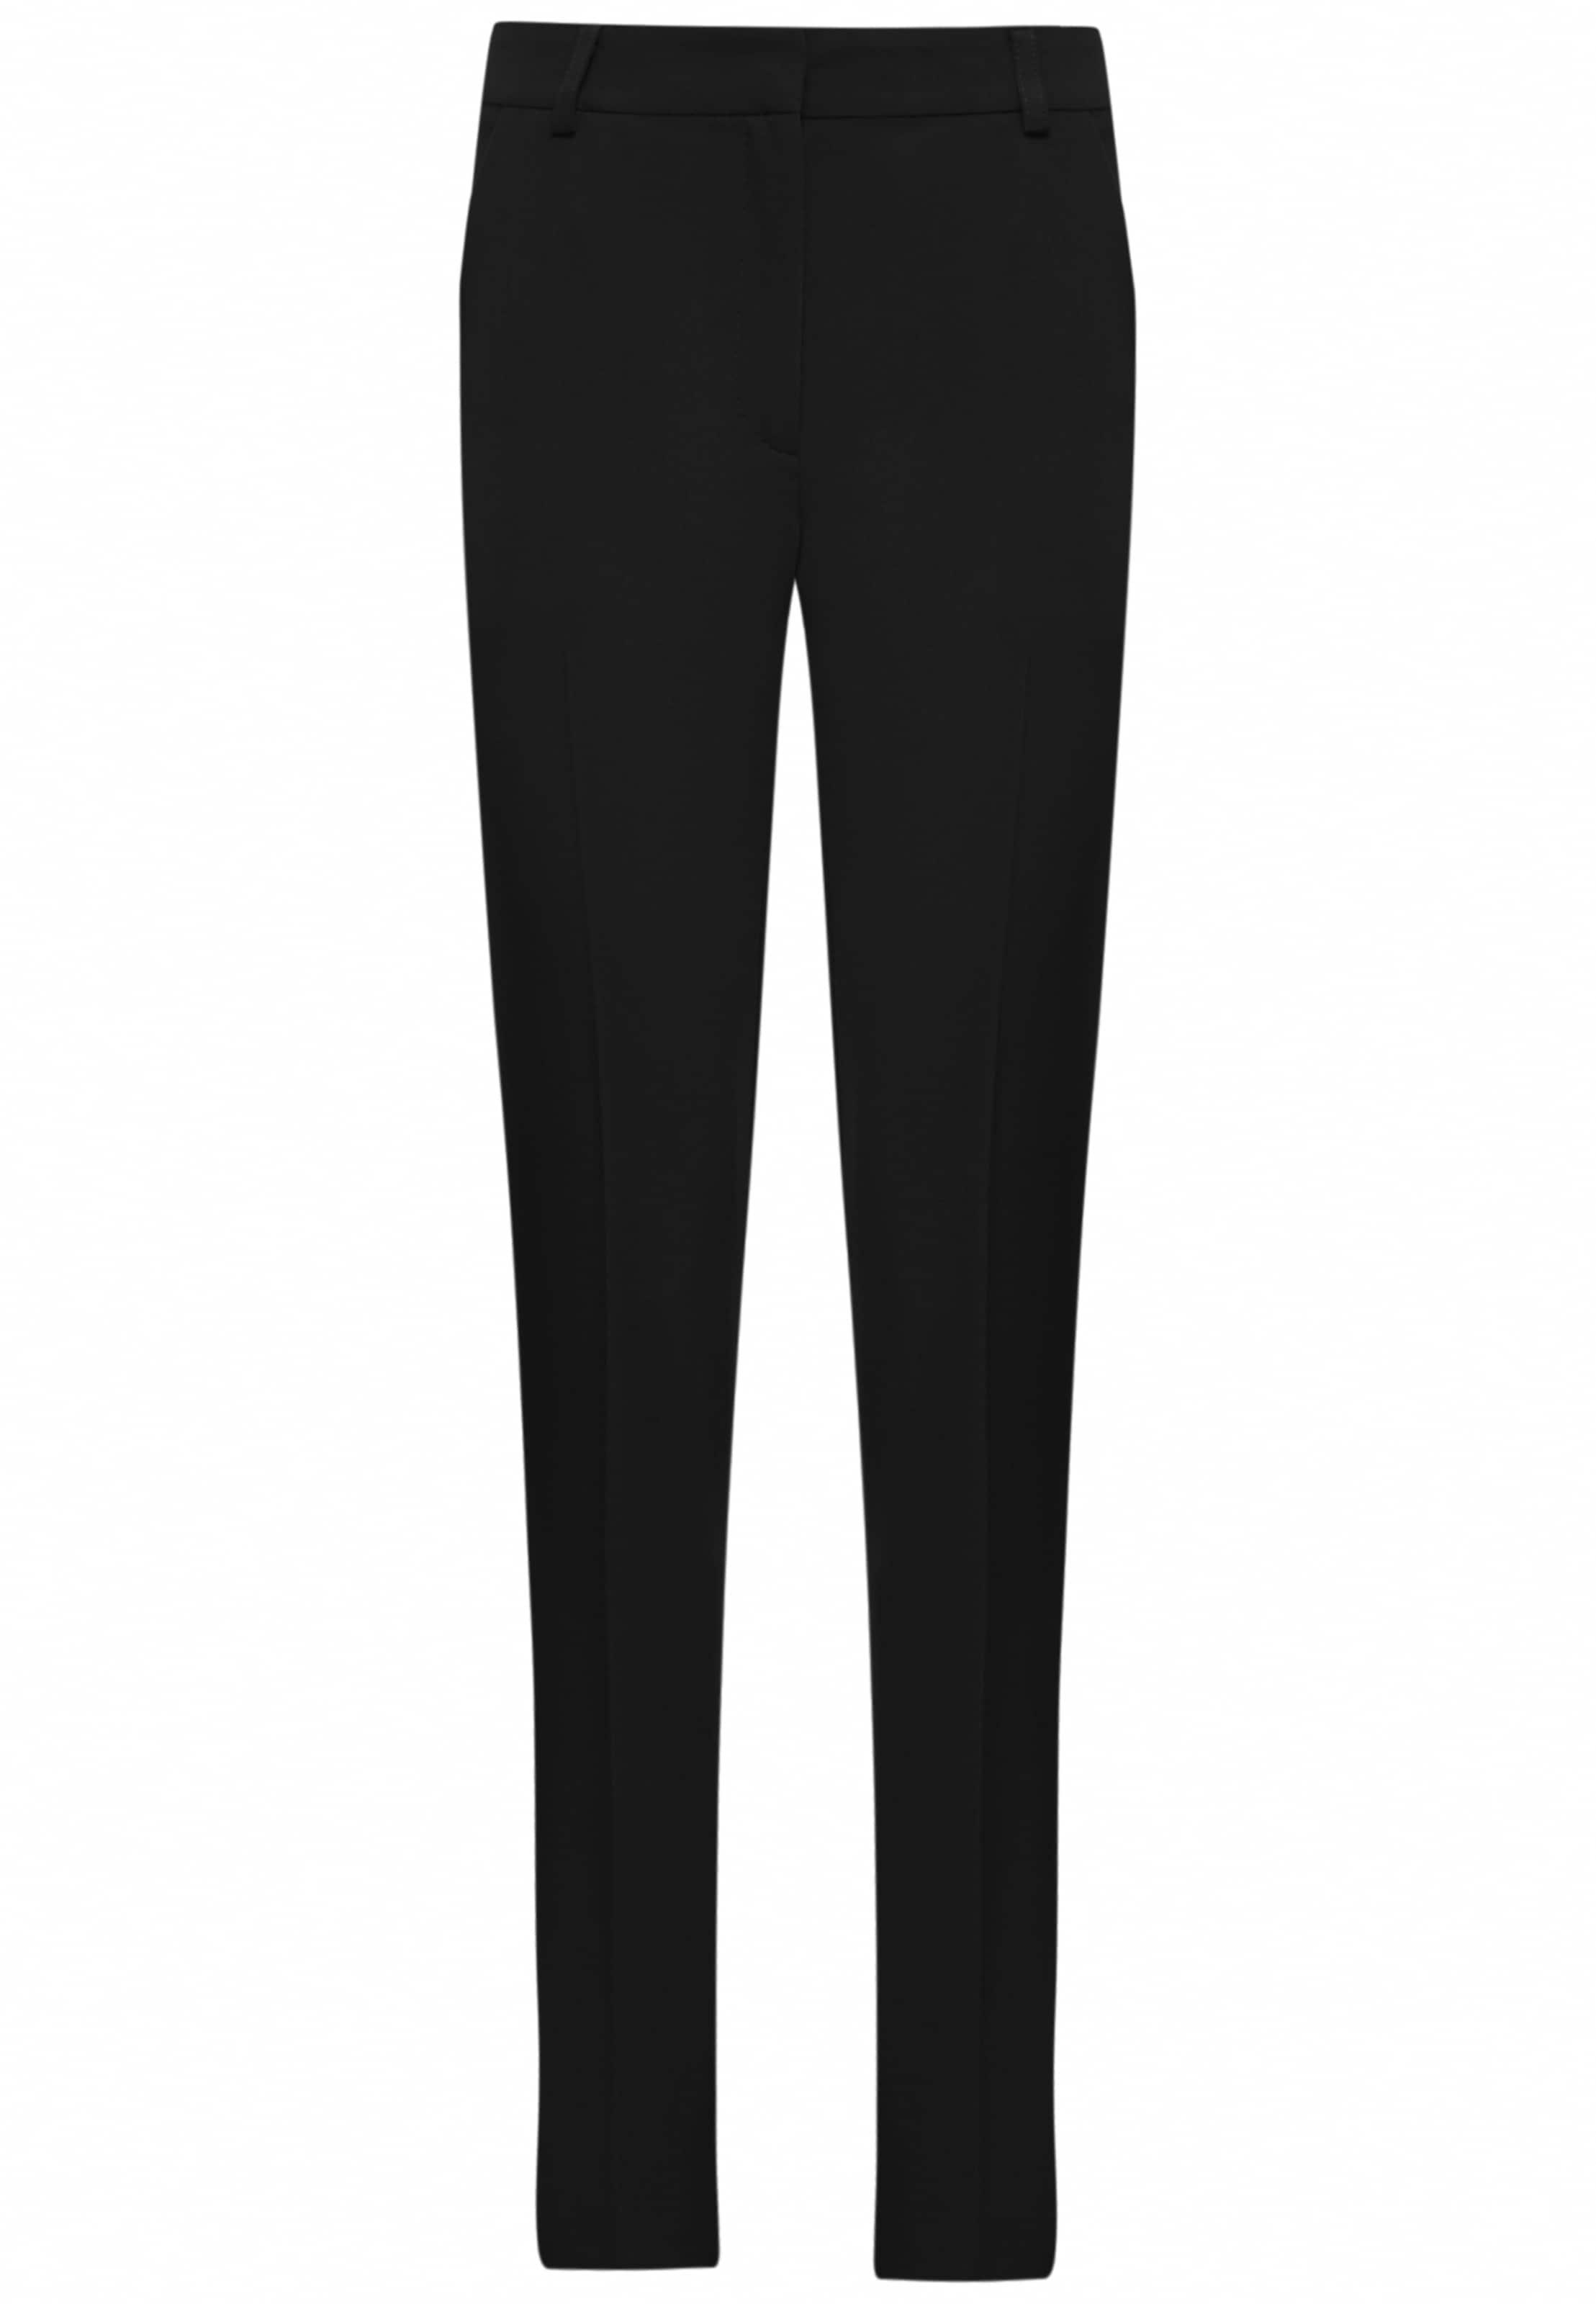 Noir Pantalon Pantalon En Noir Usha Usha En Pantalon Usha Y6f7gvby